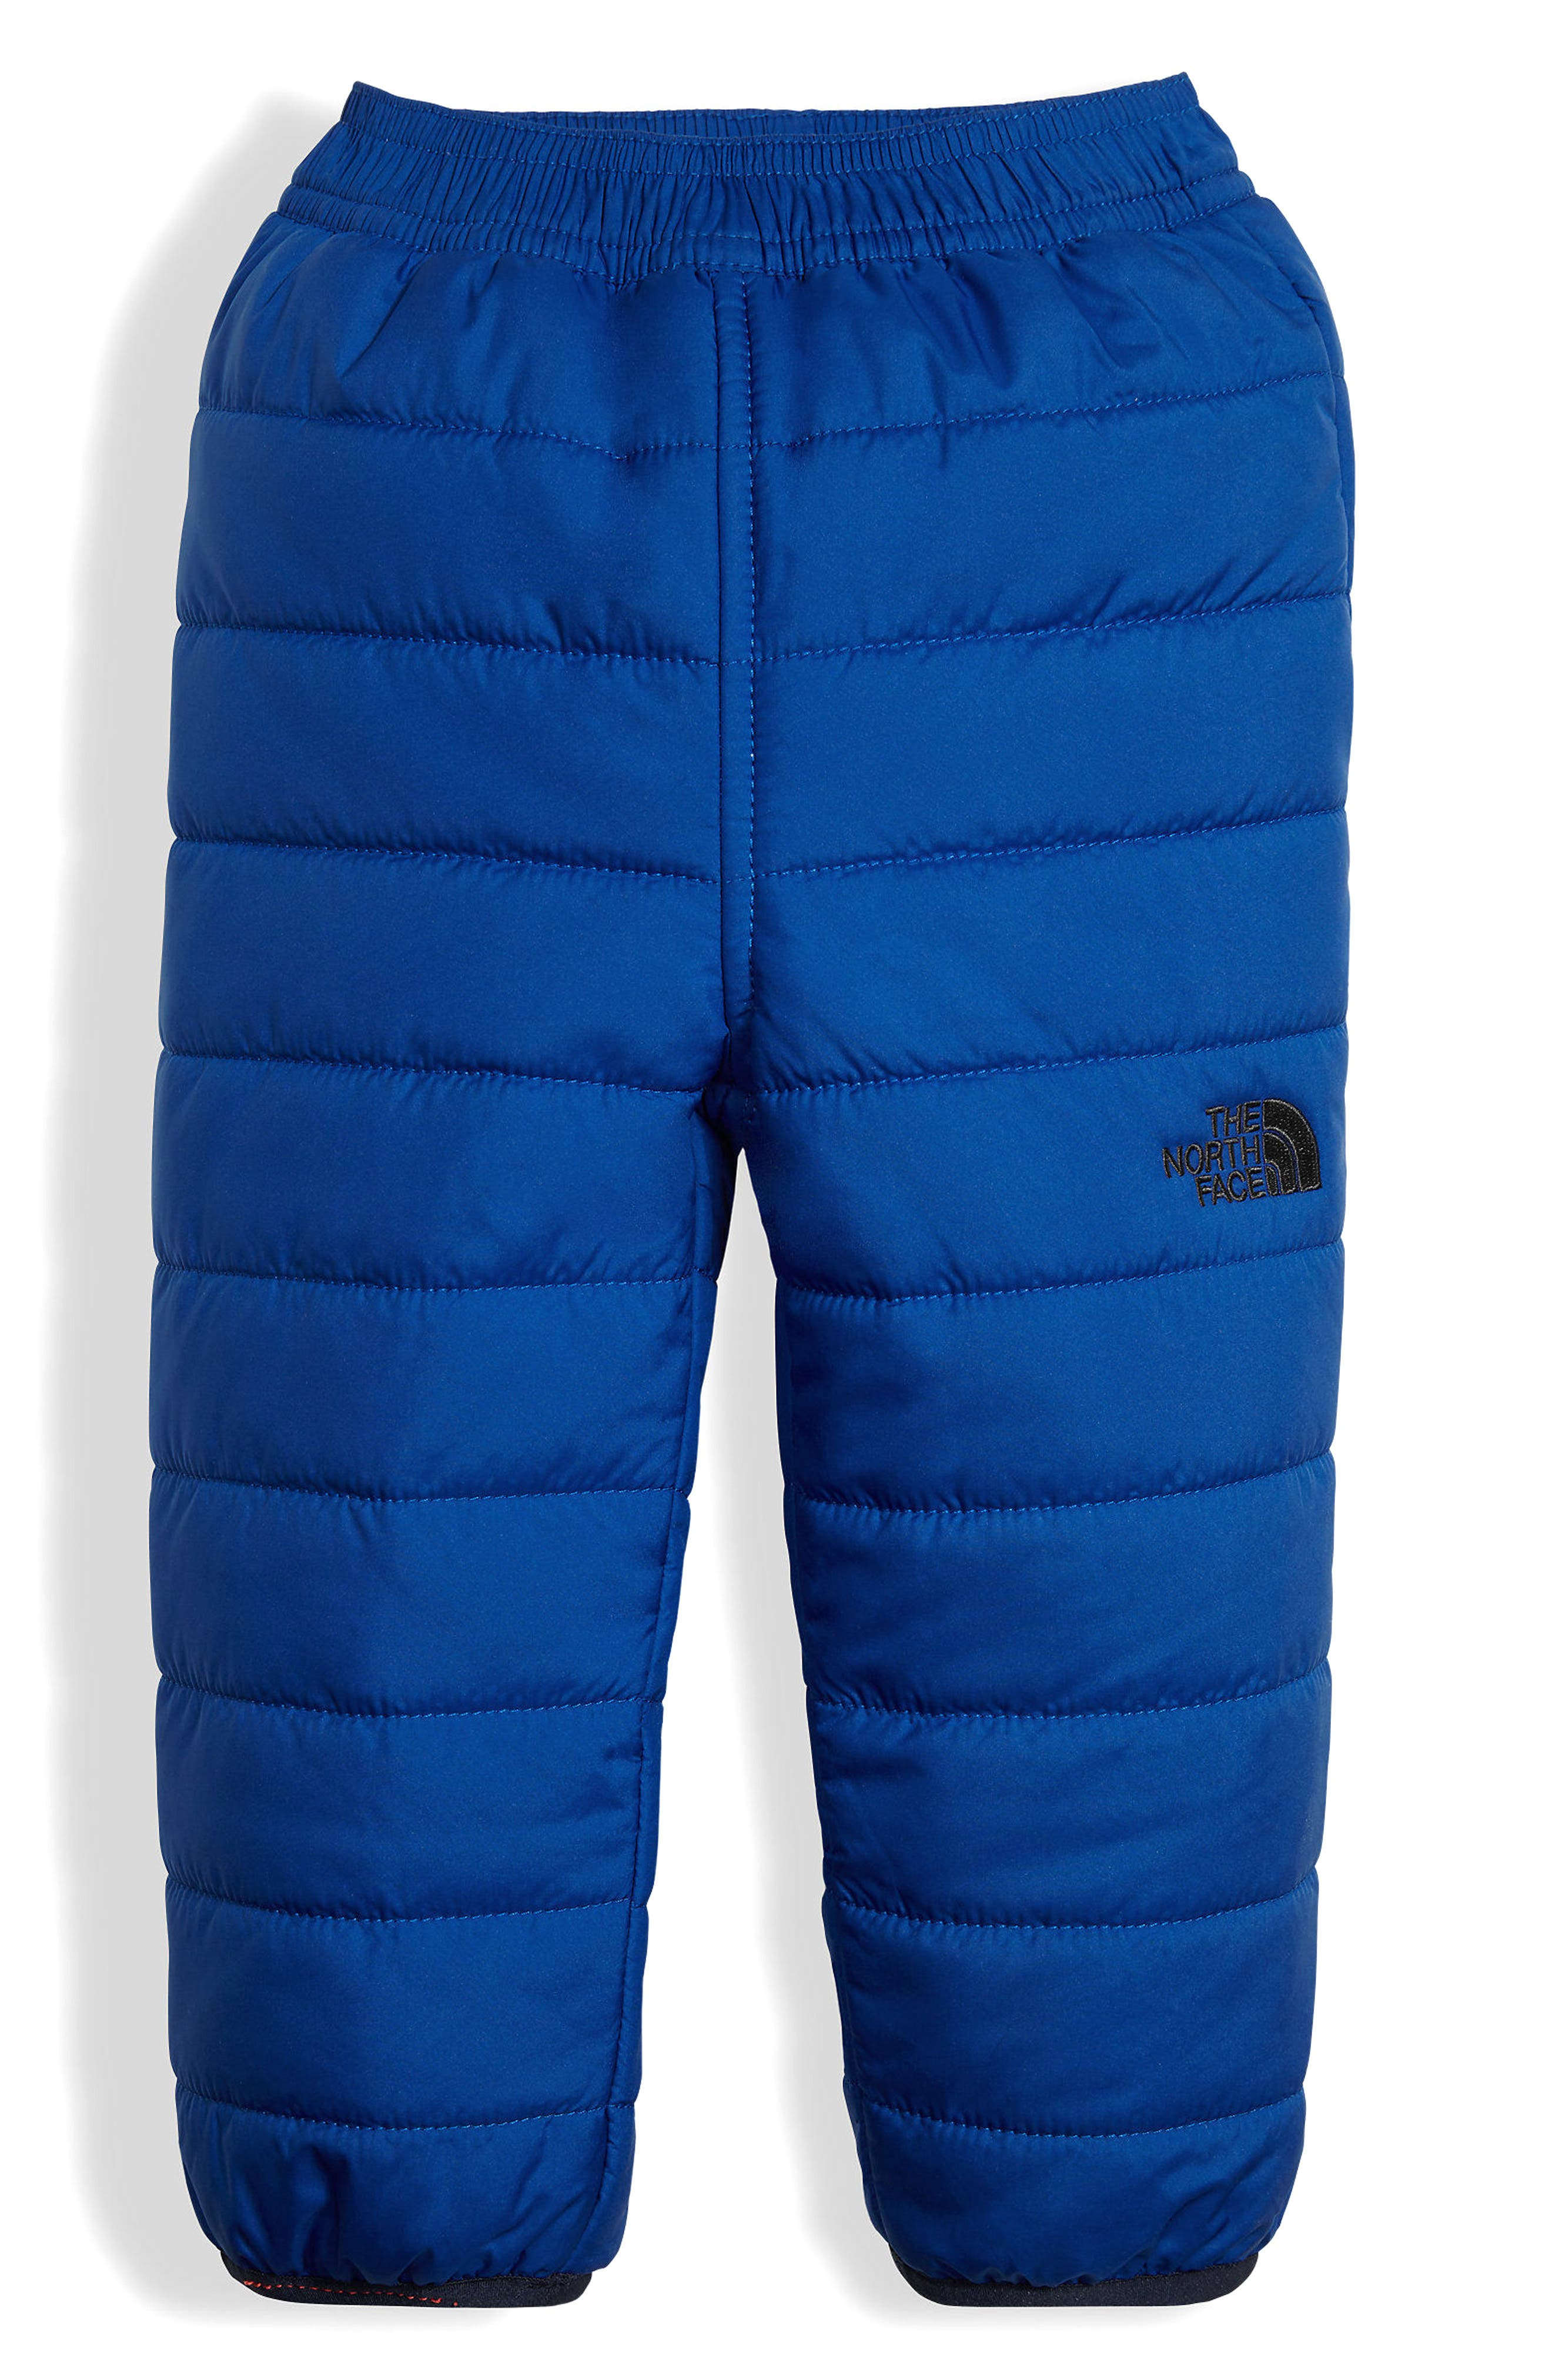 Perrito Reversible Water Repellent Pants,                             Main thumbnail 1, color,                             Bright Cobalt Blue